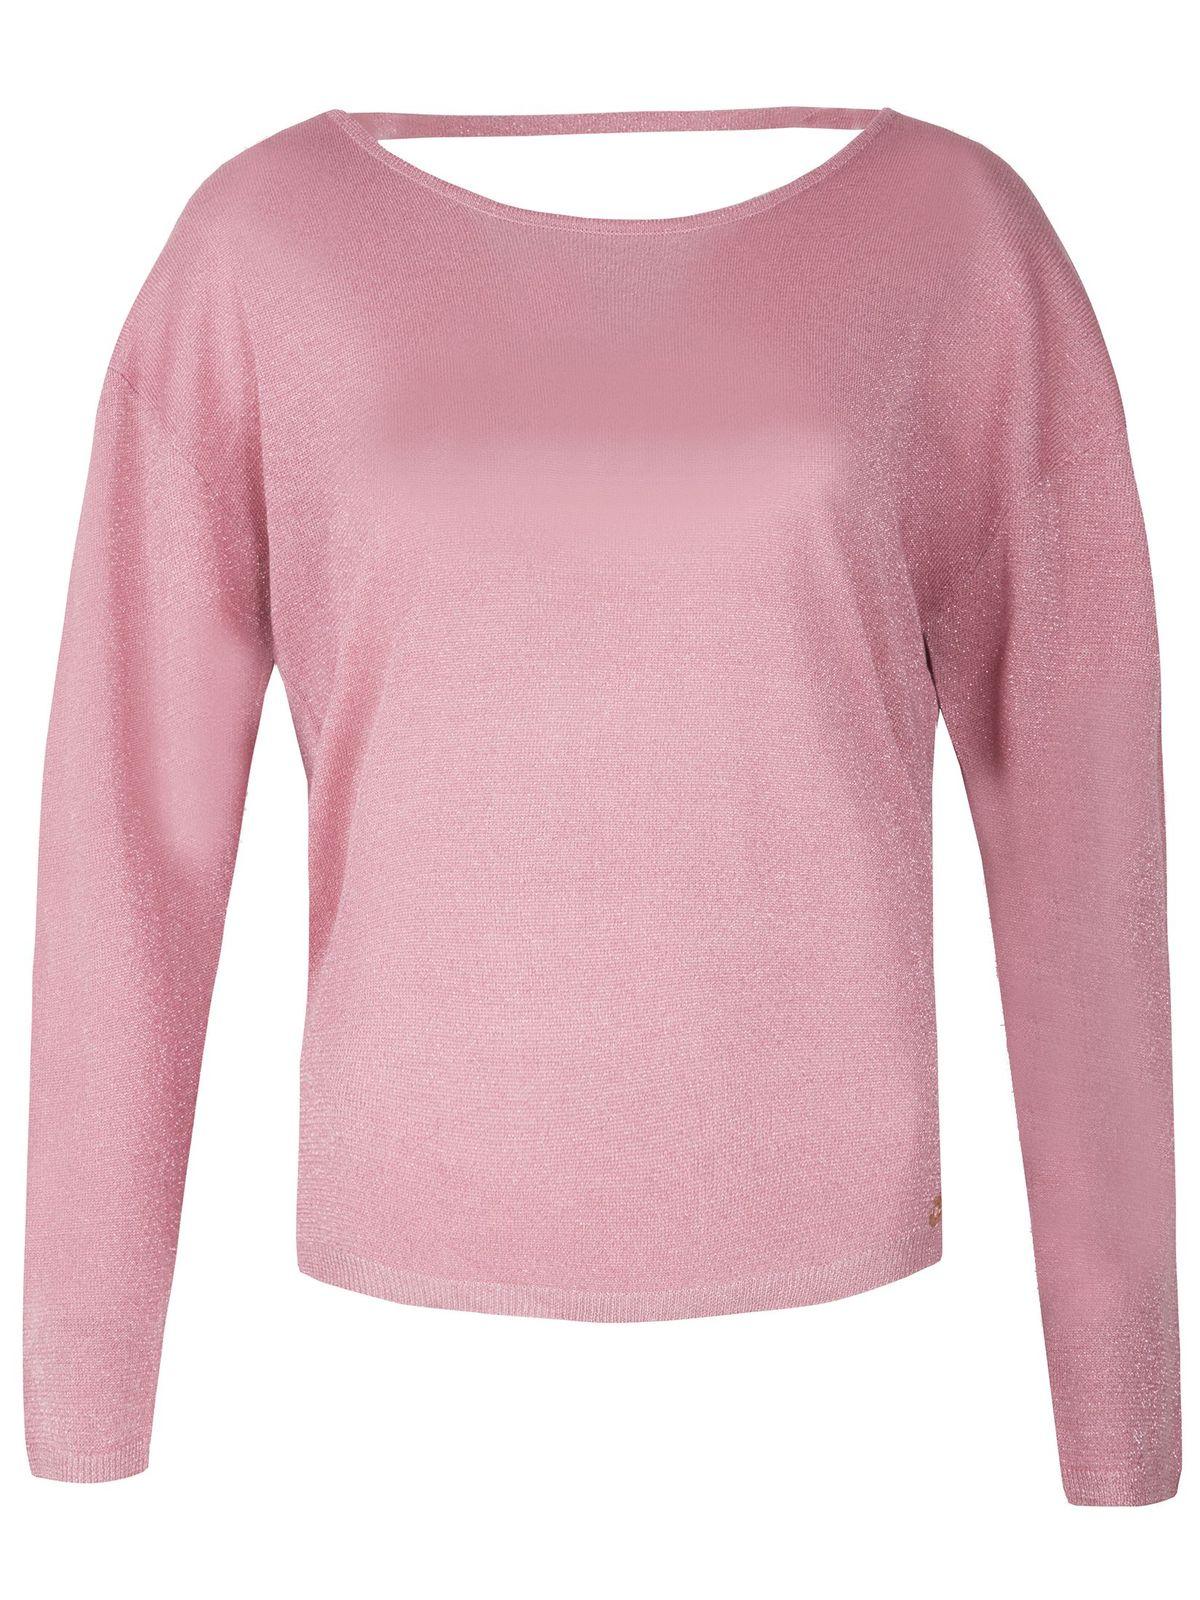 top secret γυναικεια μπλουζα - 307912